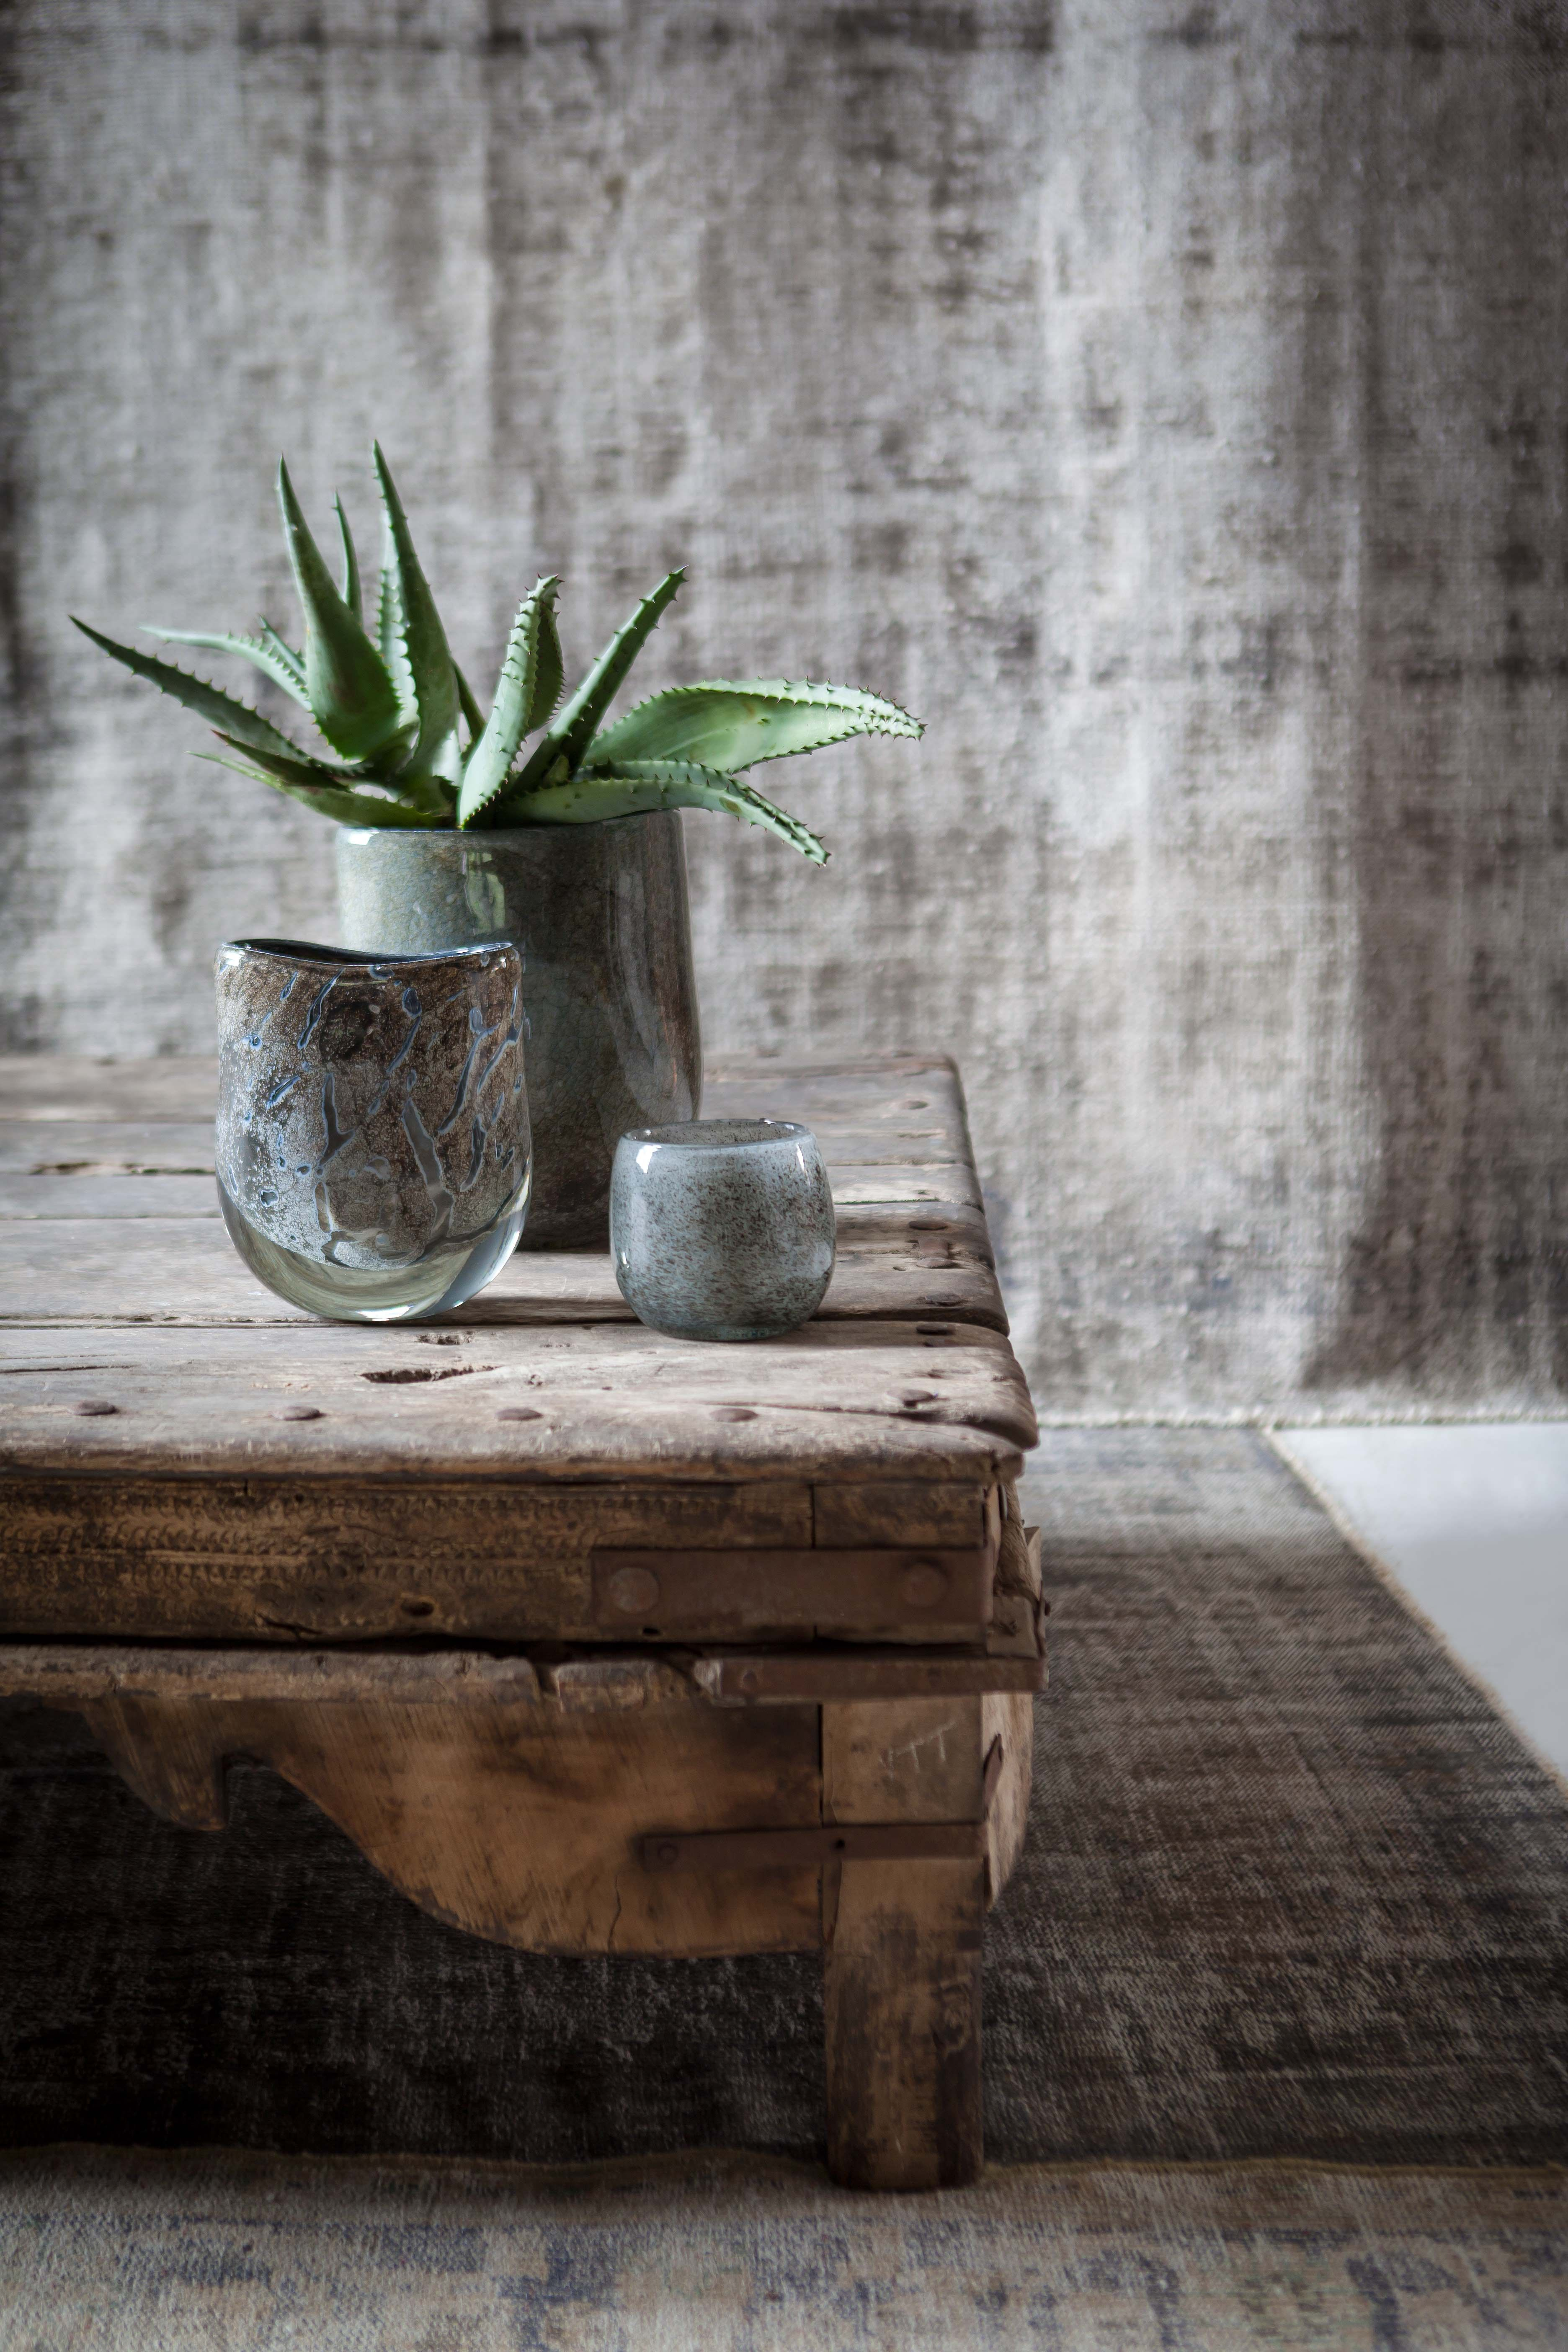 Weylandts and entertainment arrangement flowers - Home decor ideas images ...